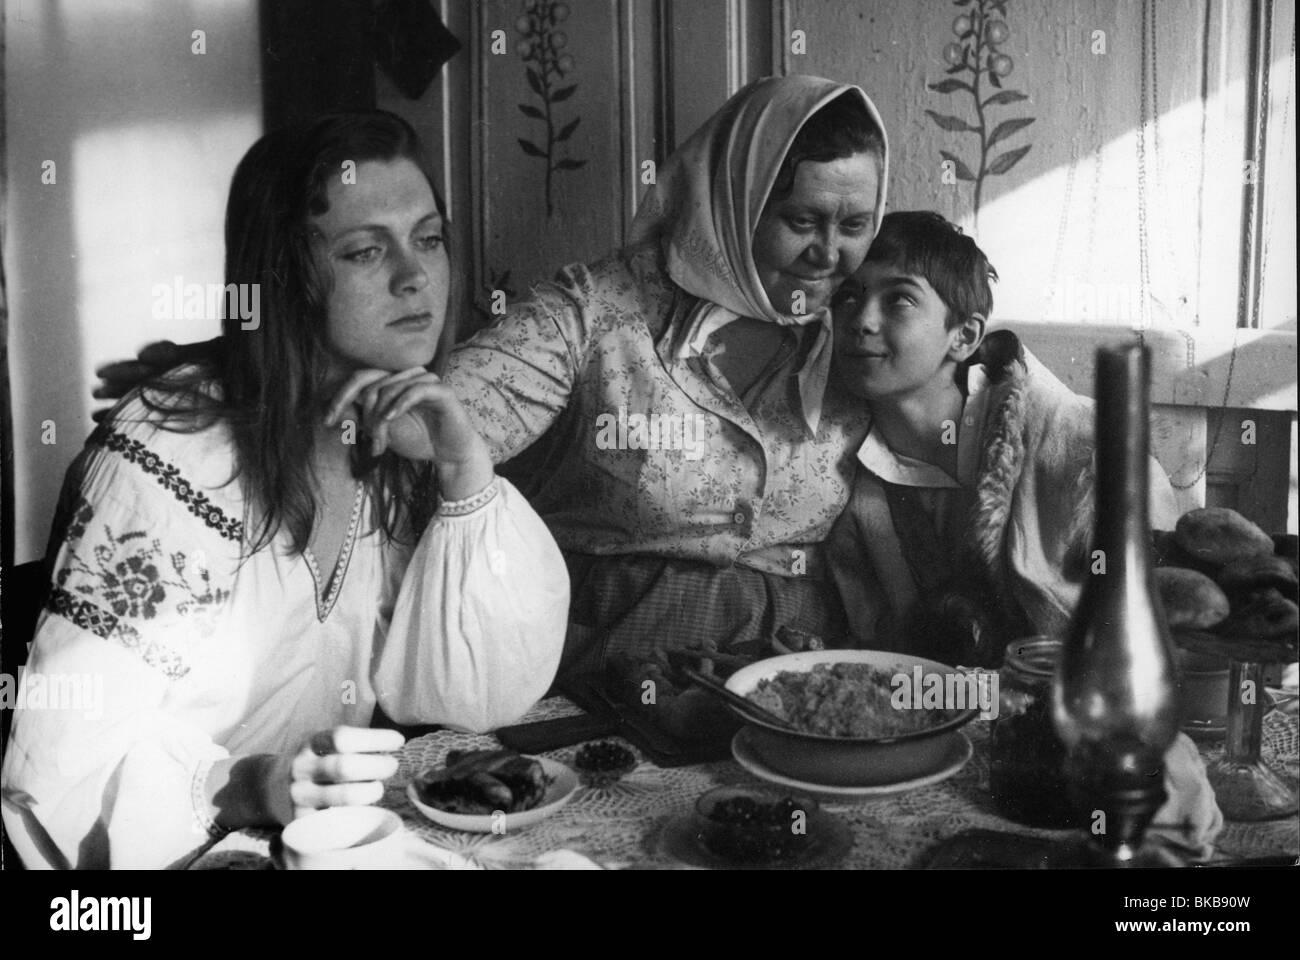 Triste Detskiy Año : 1983 Director : Jevgeni Galina Yevtushenko, Sergei Gusak Stakhanova Imagen De Stock